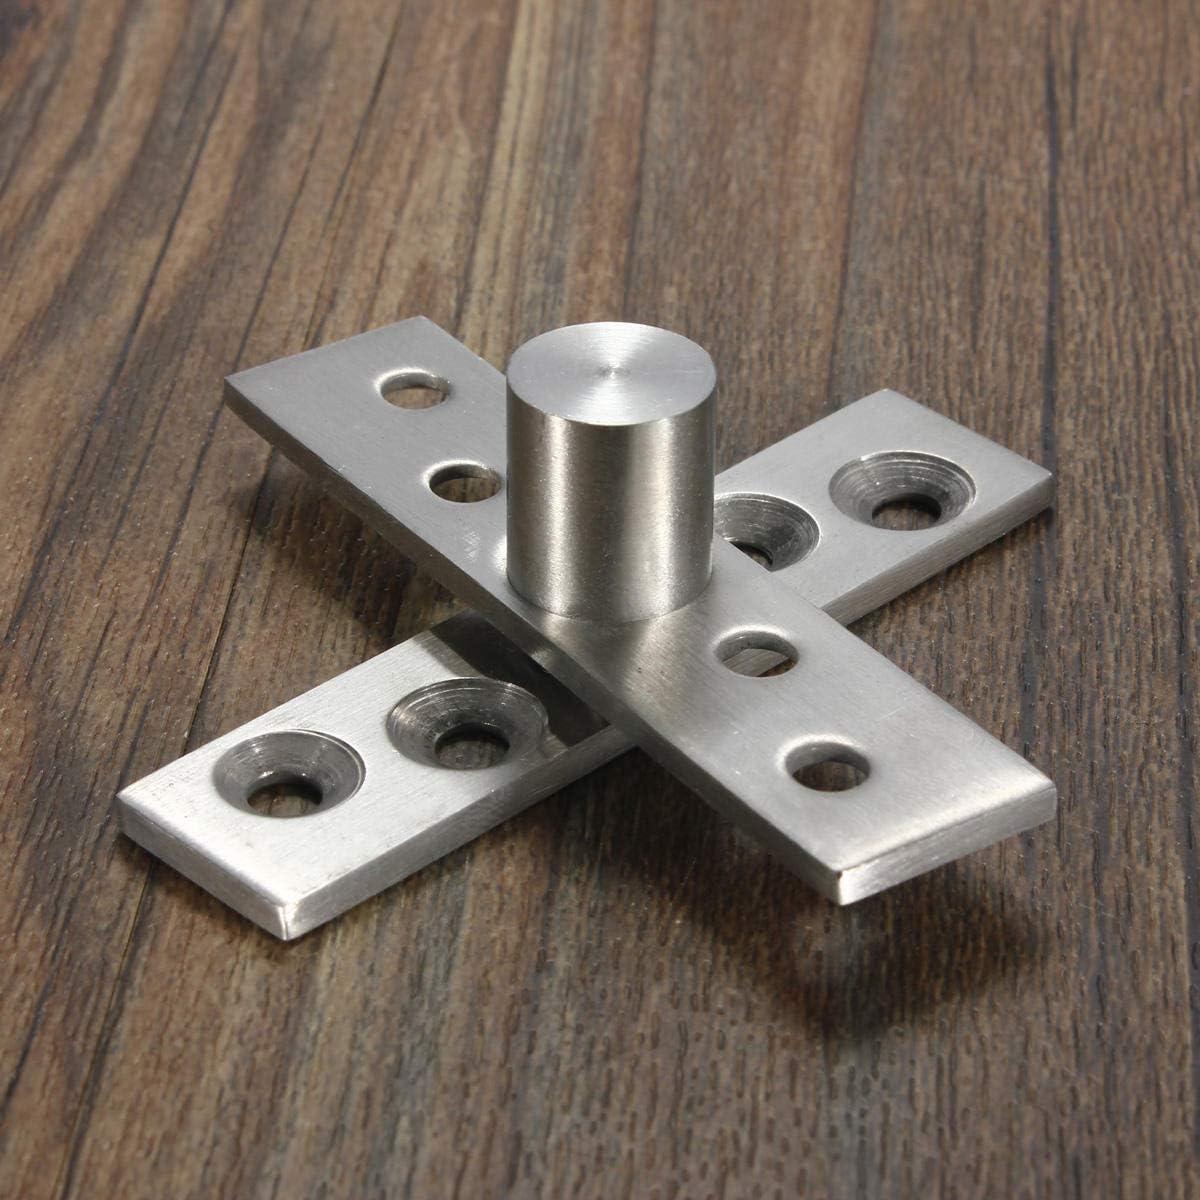 OKIl 2pcs 360 Degree Door Pivot Hinge Hardware Silver 74mm Length